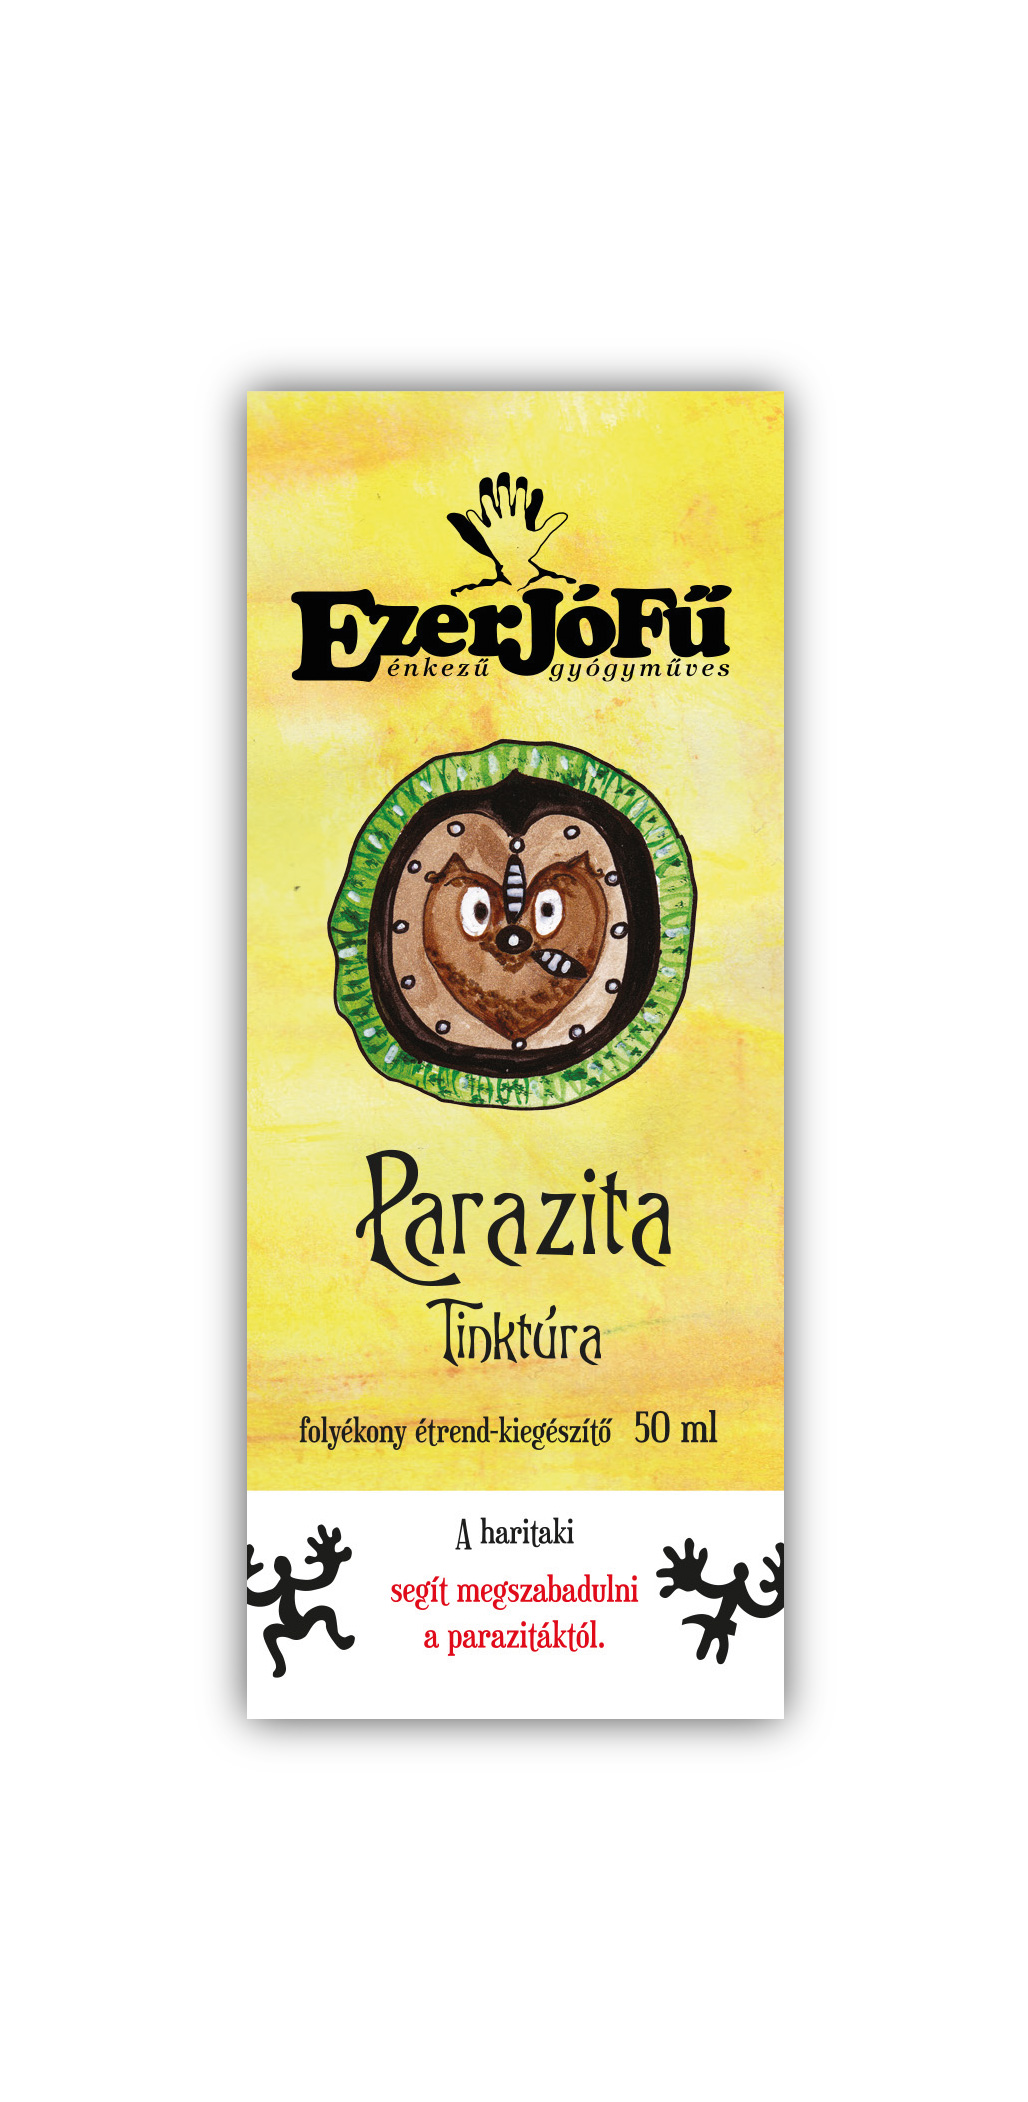 parazita tiszta étrend - a legjobb anti-parazita tea online